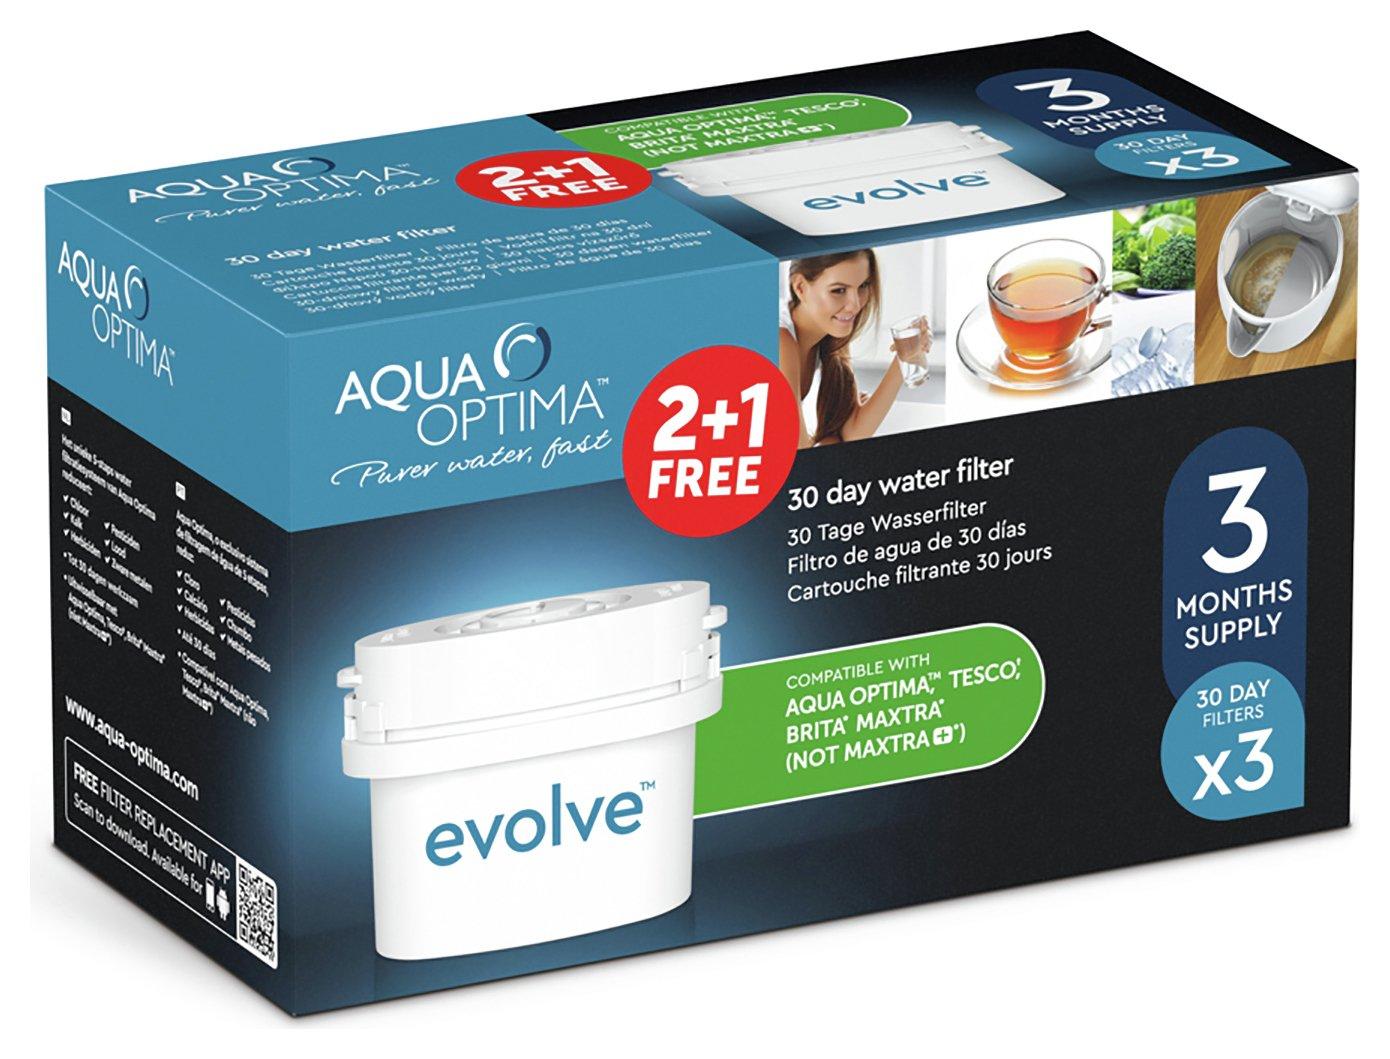 Aqua Optima Evolve Water Filter Cartridges - 3 Pack